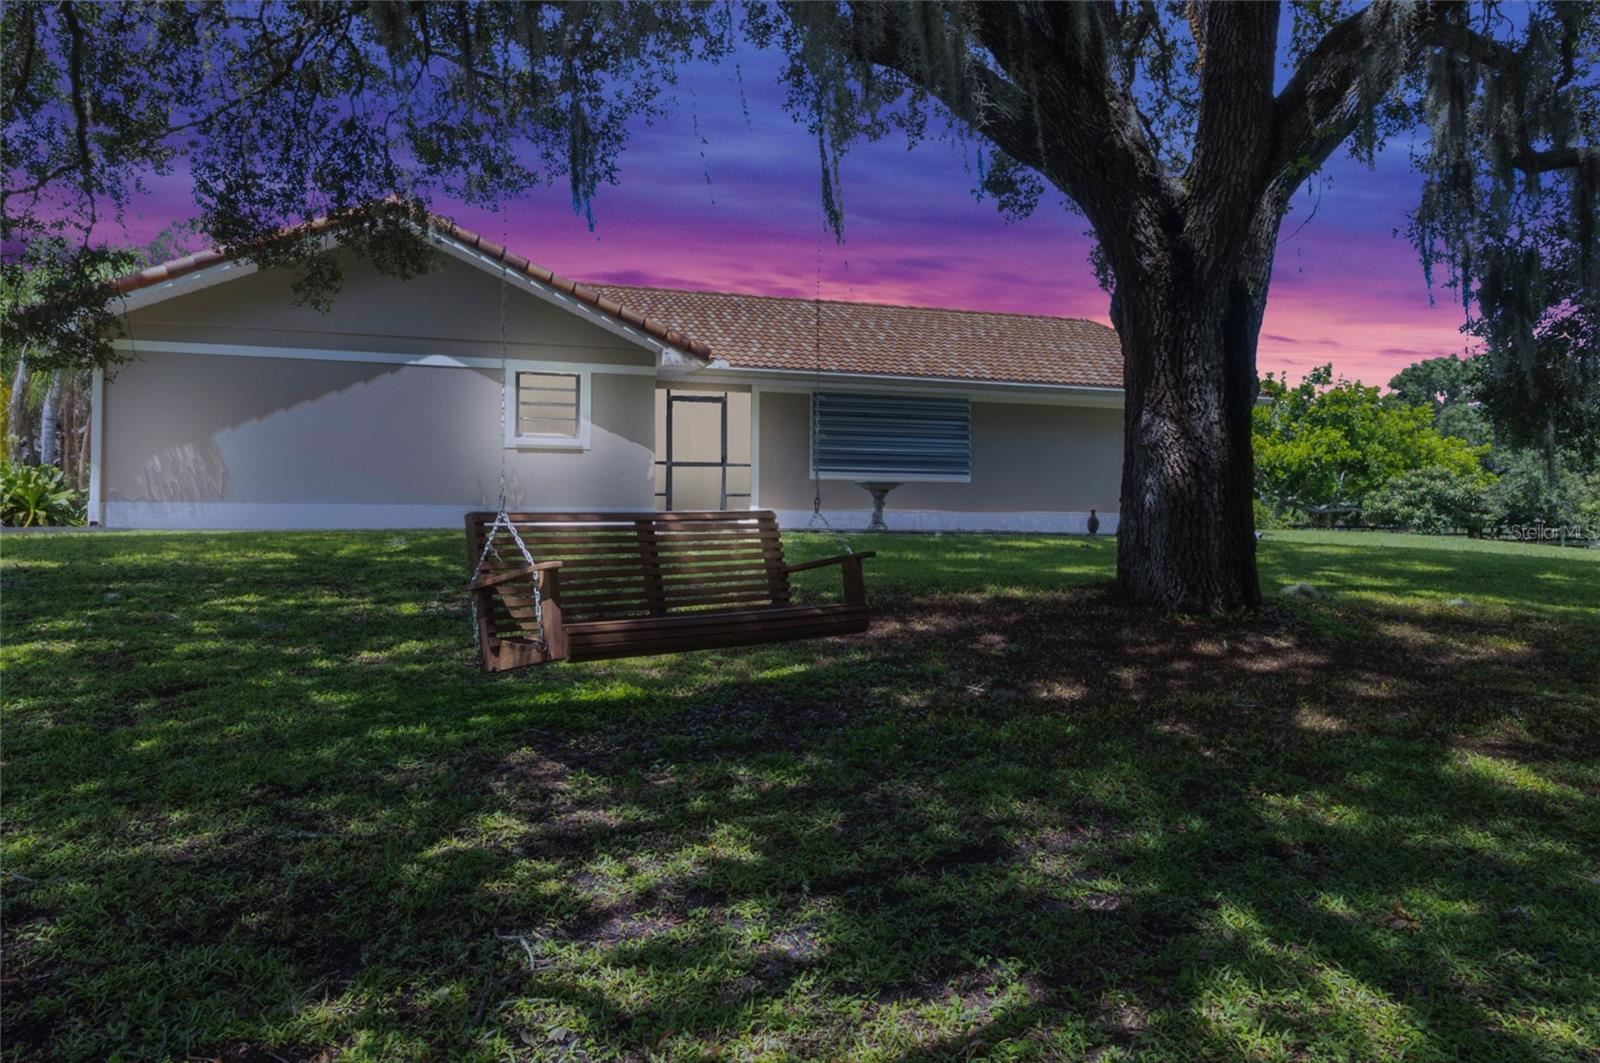 Photo of 249 GREENCOVE ROAD, VENICE, FL 34292 (MLS # N6117258)